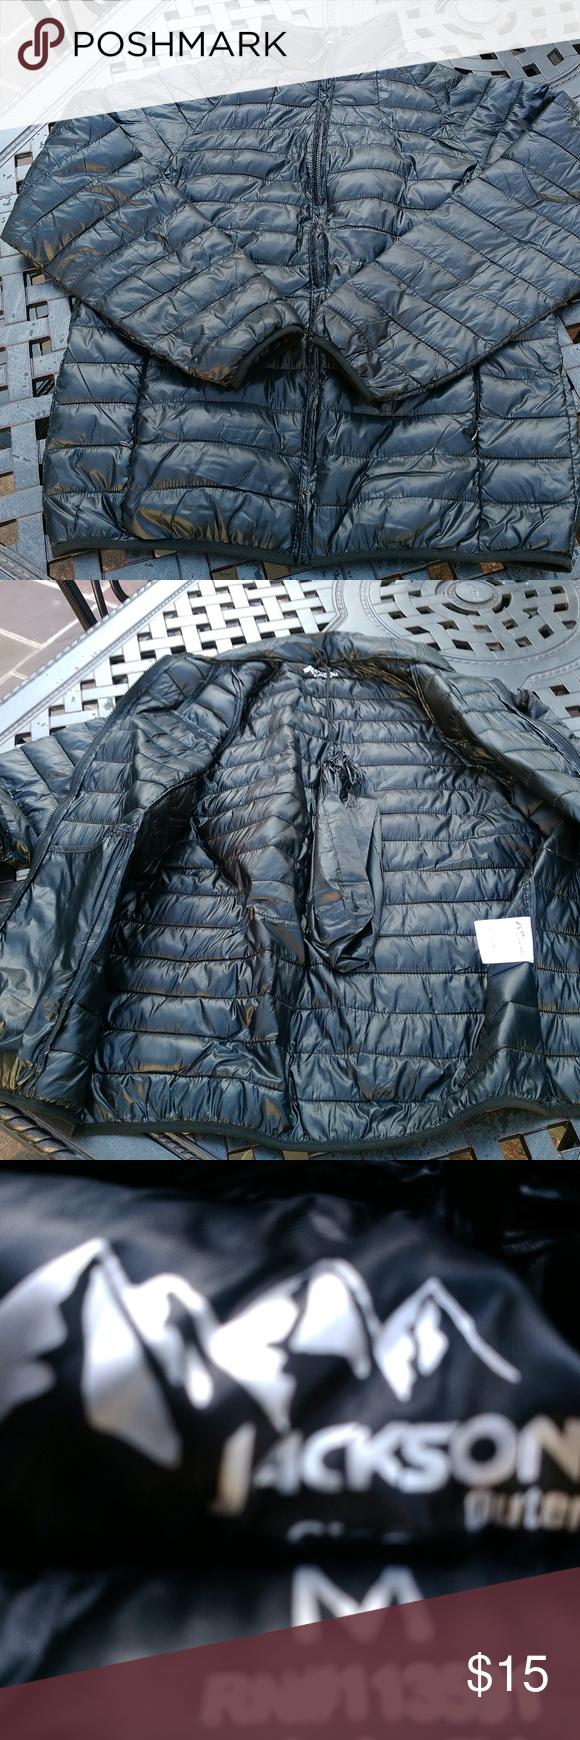 Jackson Hole Outerwear Puffer Jacket Medium New Without Tags Jackson Hole Outerwear Jackets Coats Jackson Hole Outerwear Puffer Jackets [ 1740 x 580 Pixel ]